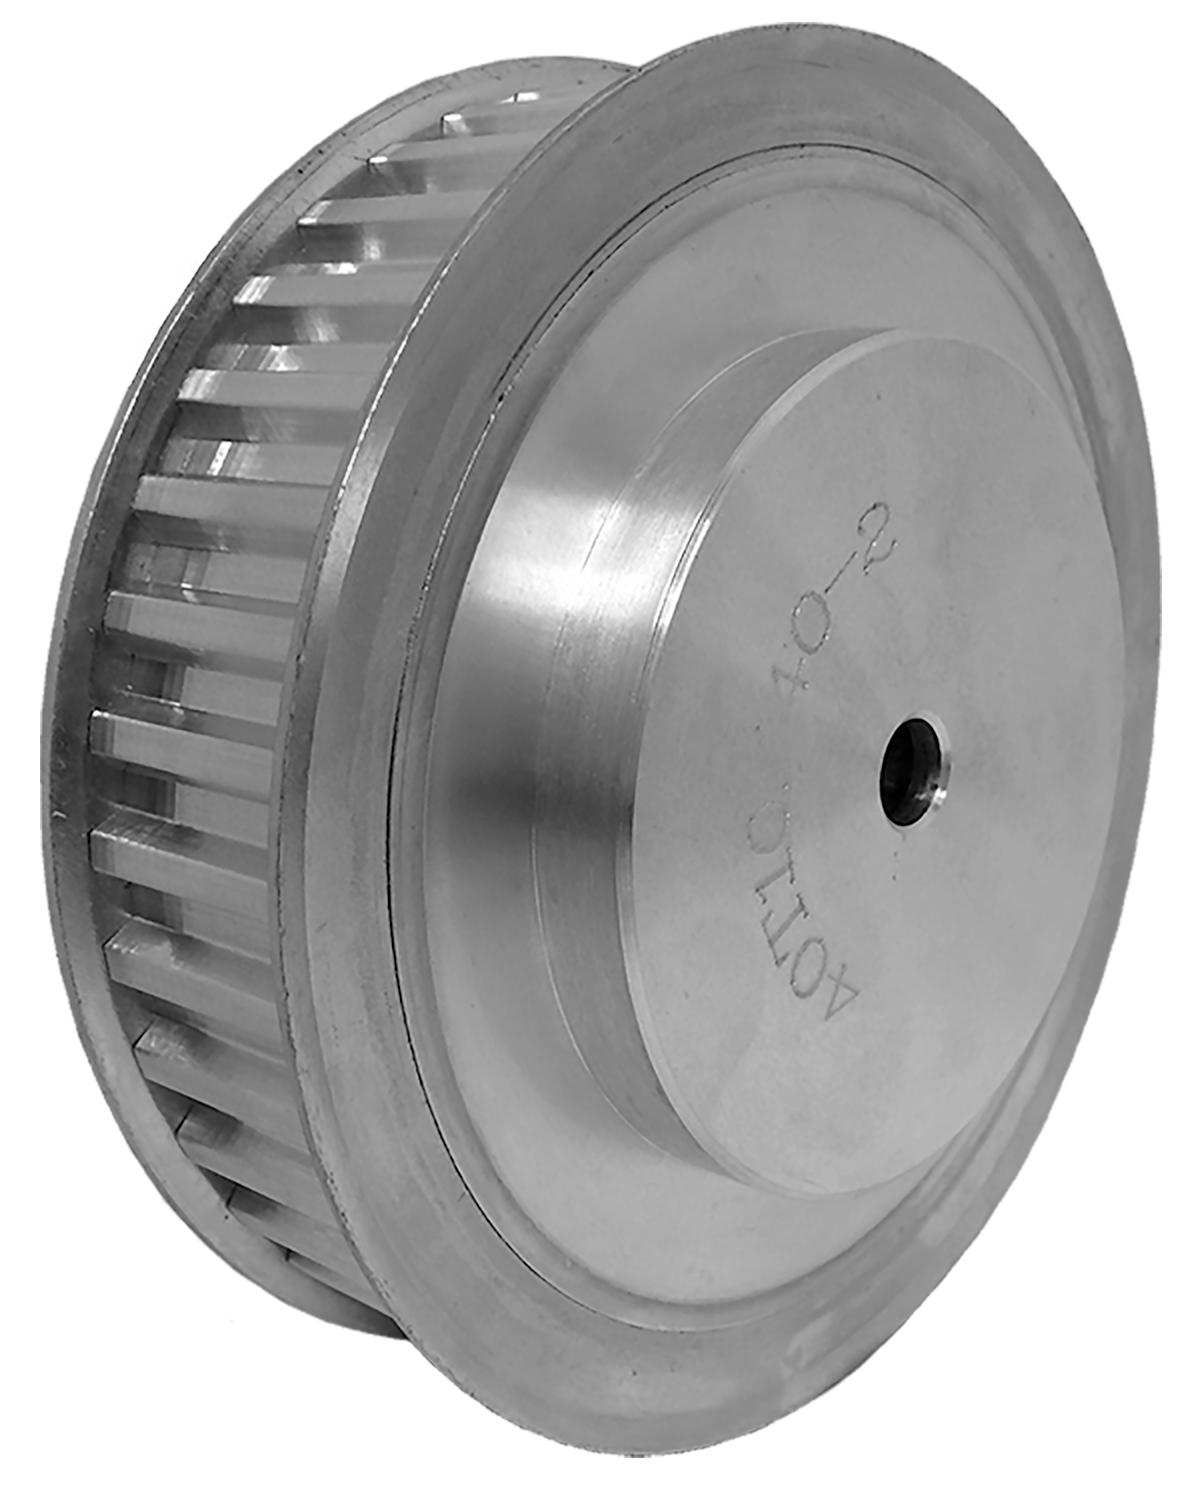 40T10/40-2 - Aluminum Metric Pulleys